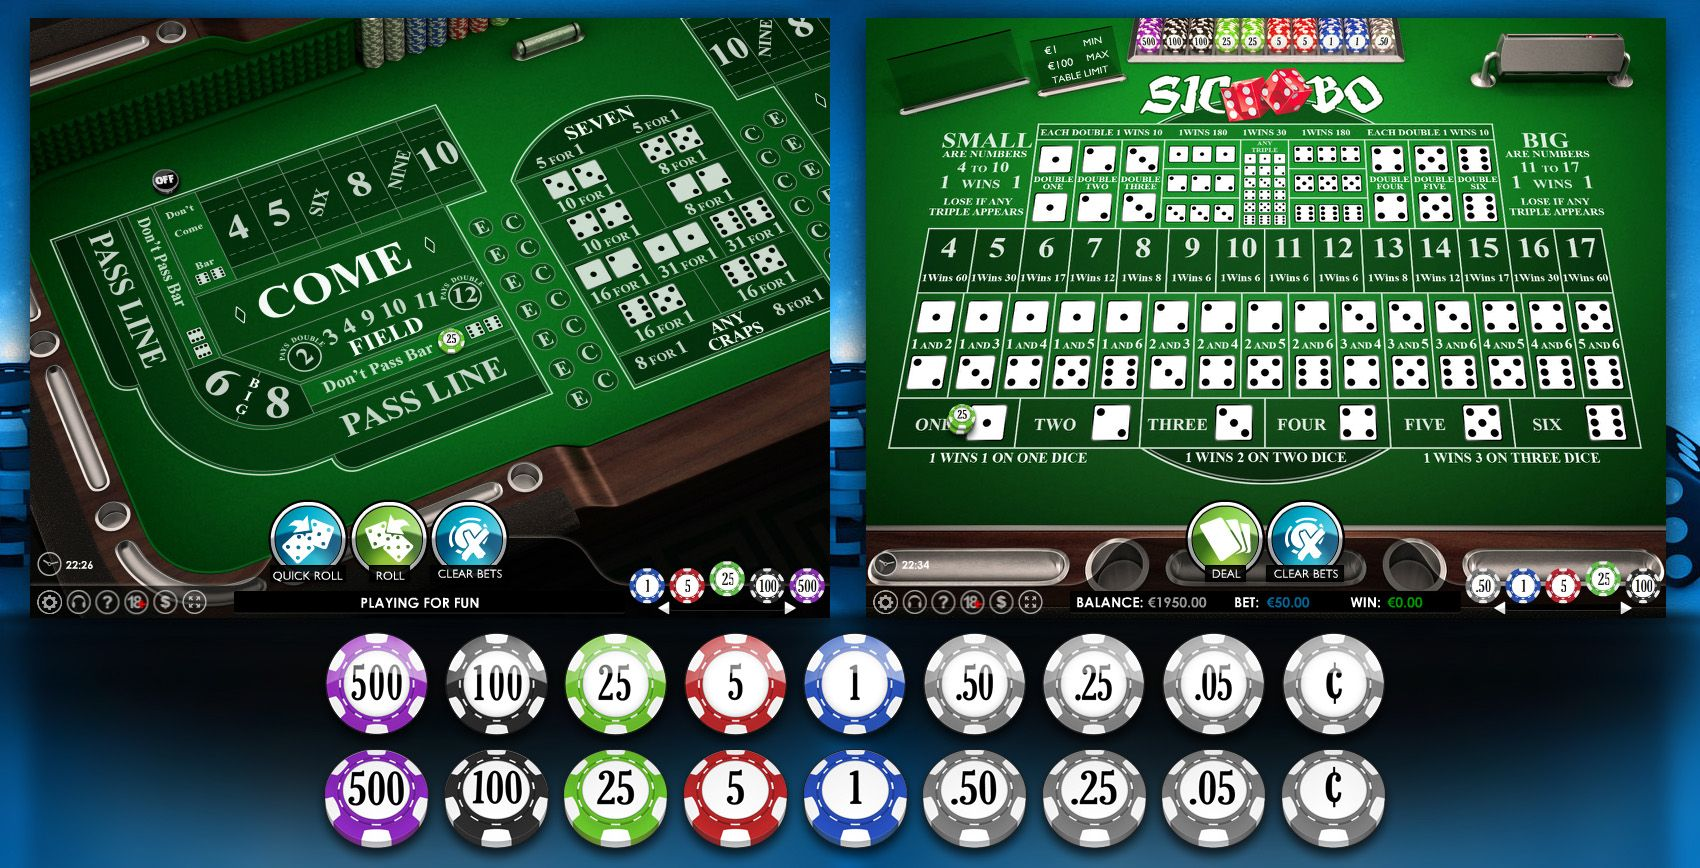 Casino Craps / SicBo Online Game